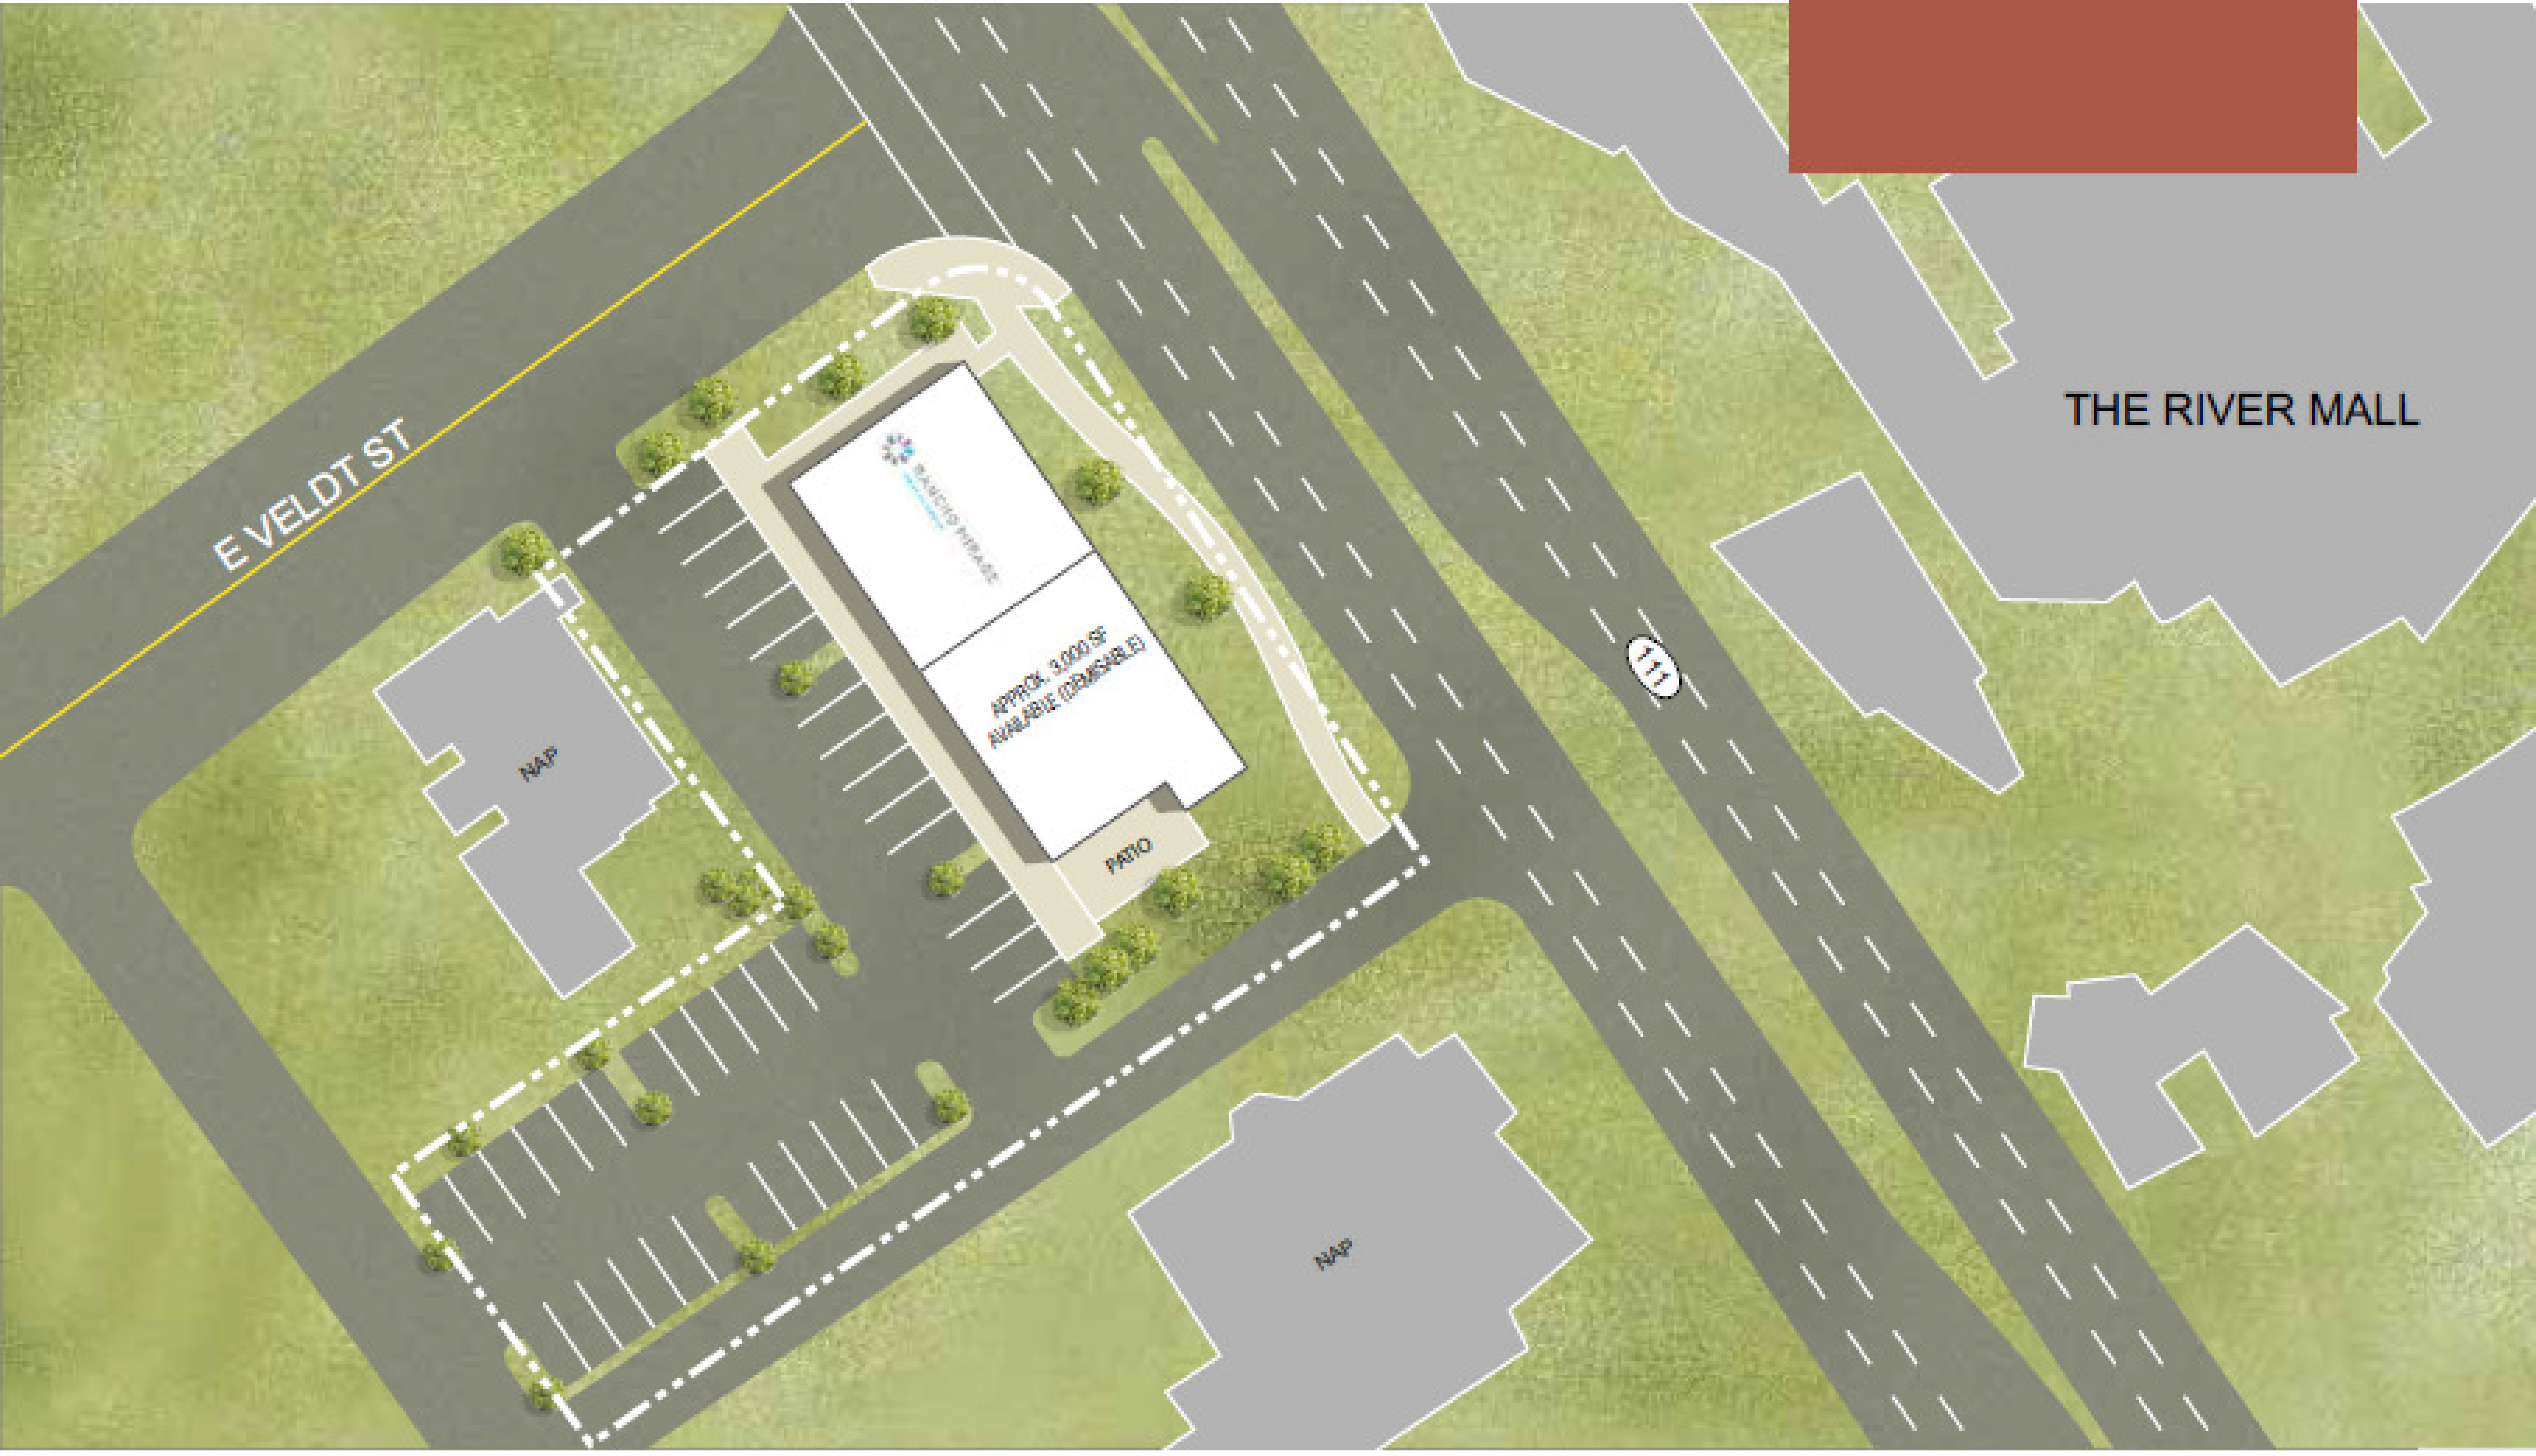 Rancho Mirage-Hwy 111 & Veldt St: site plan